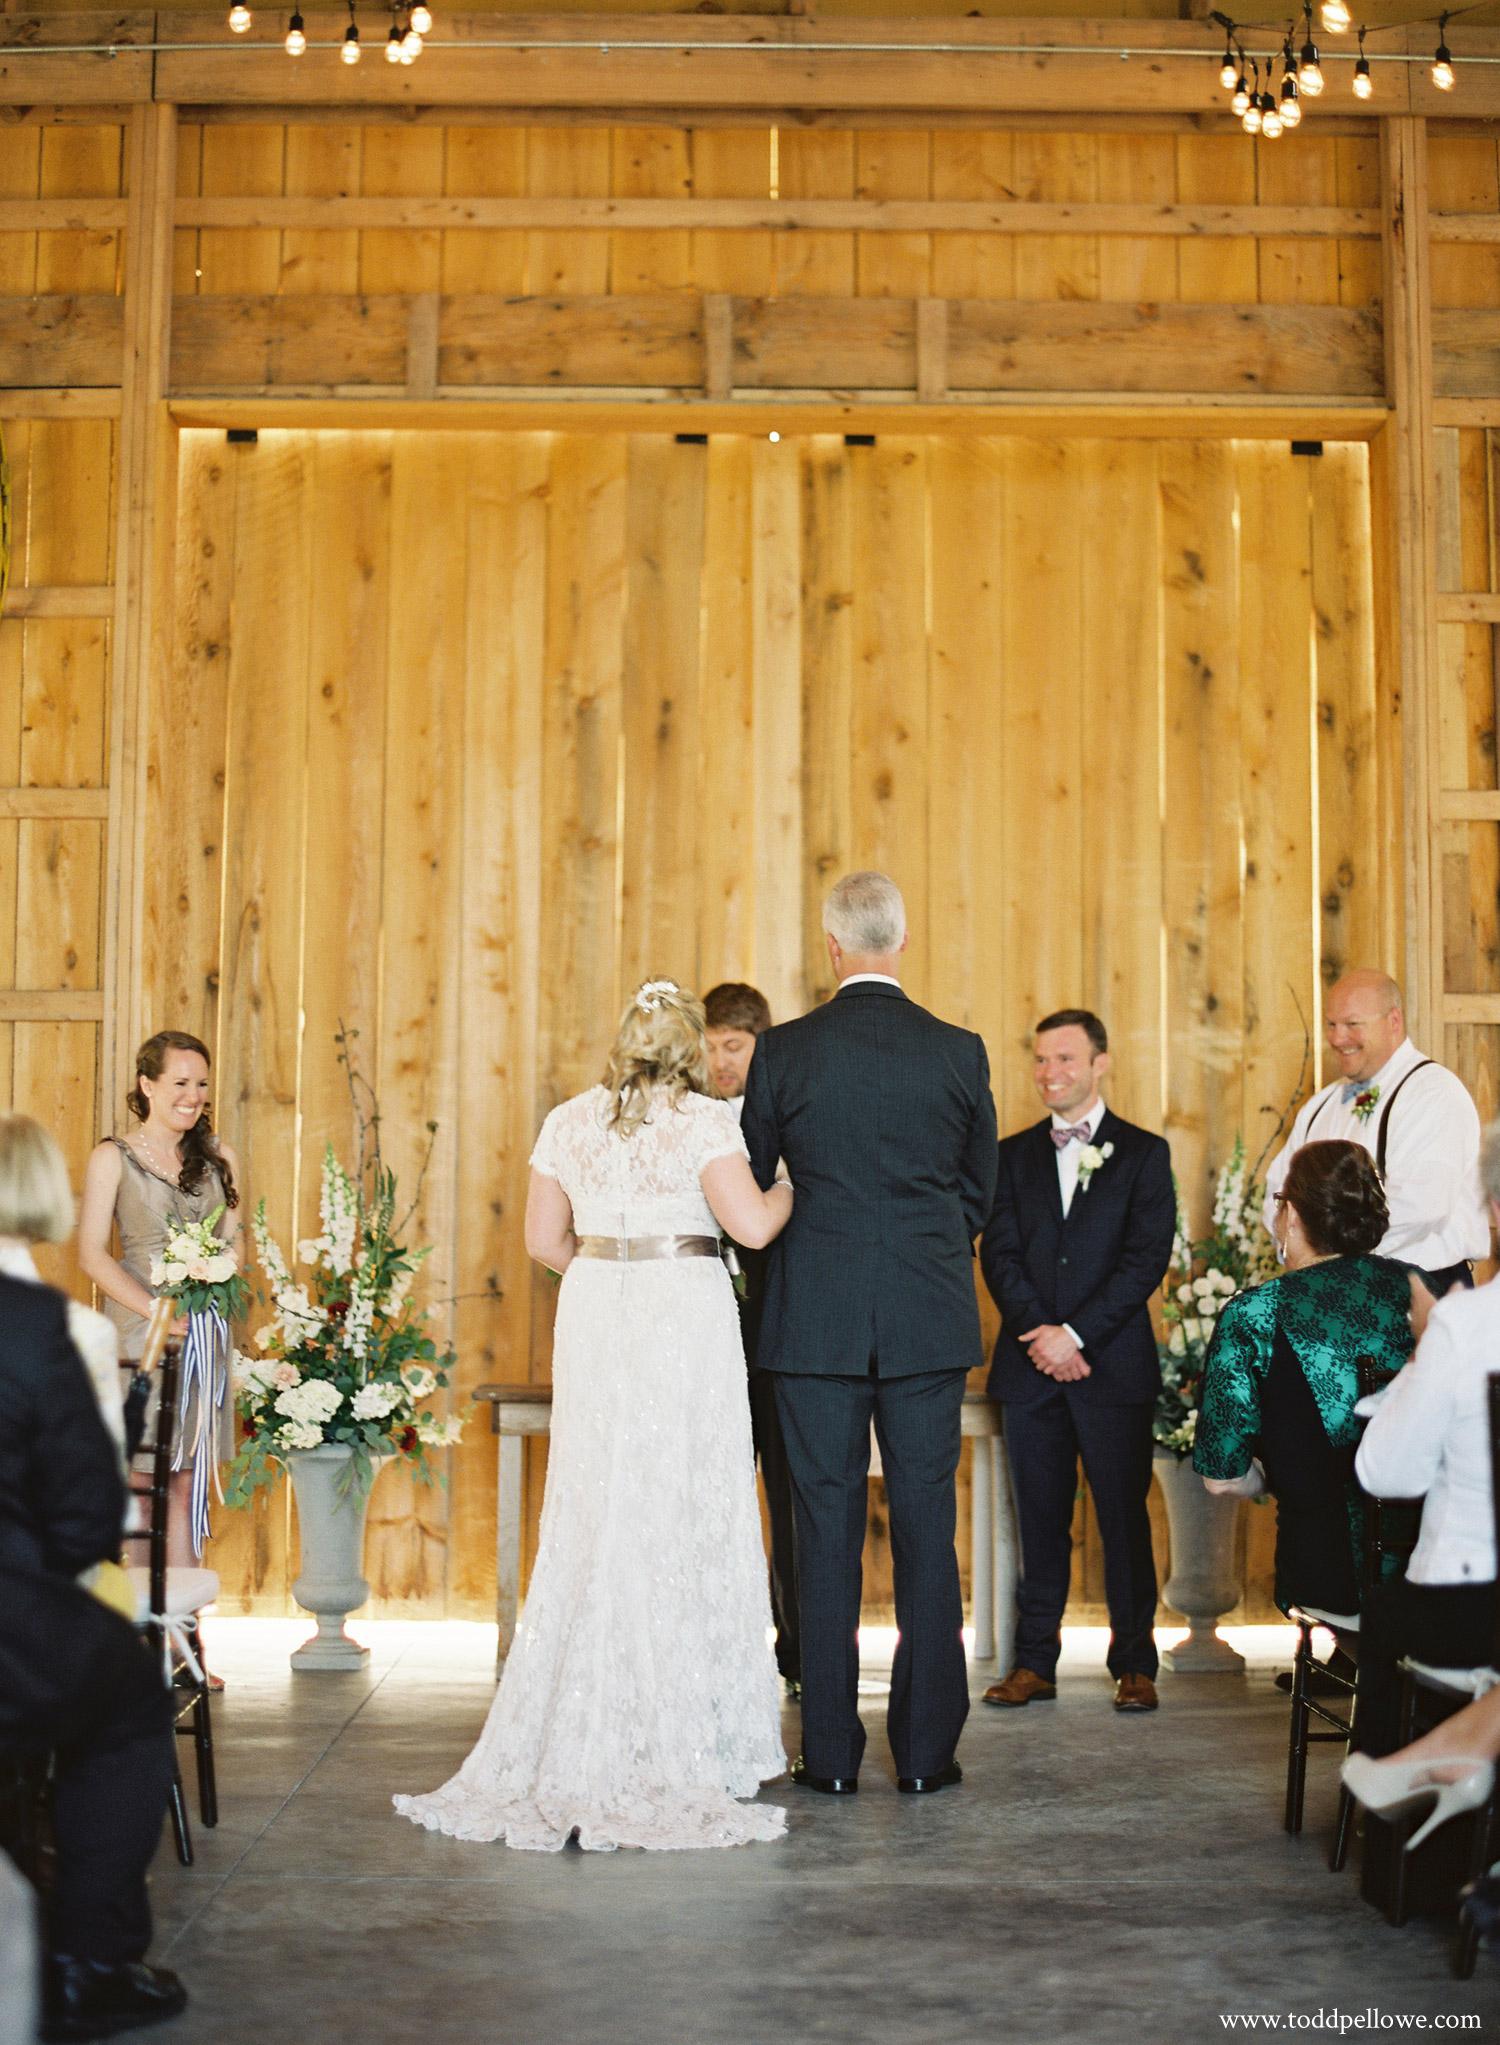 17-long-ridge-farm-wedding-shelbyville-014.jpg